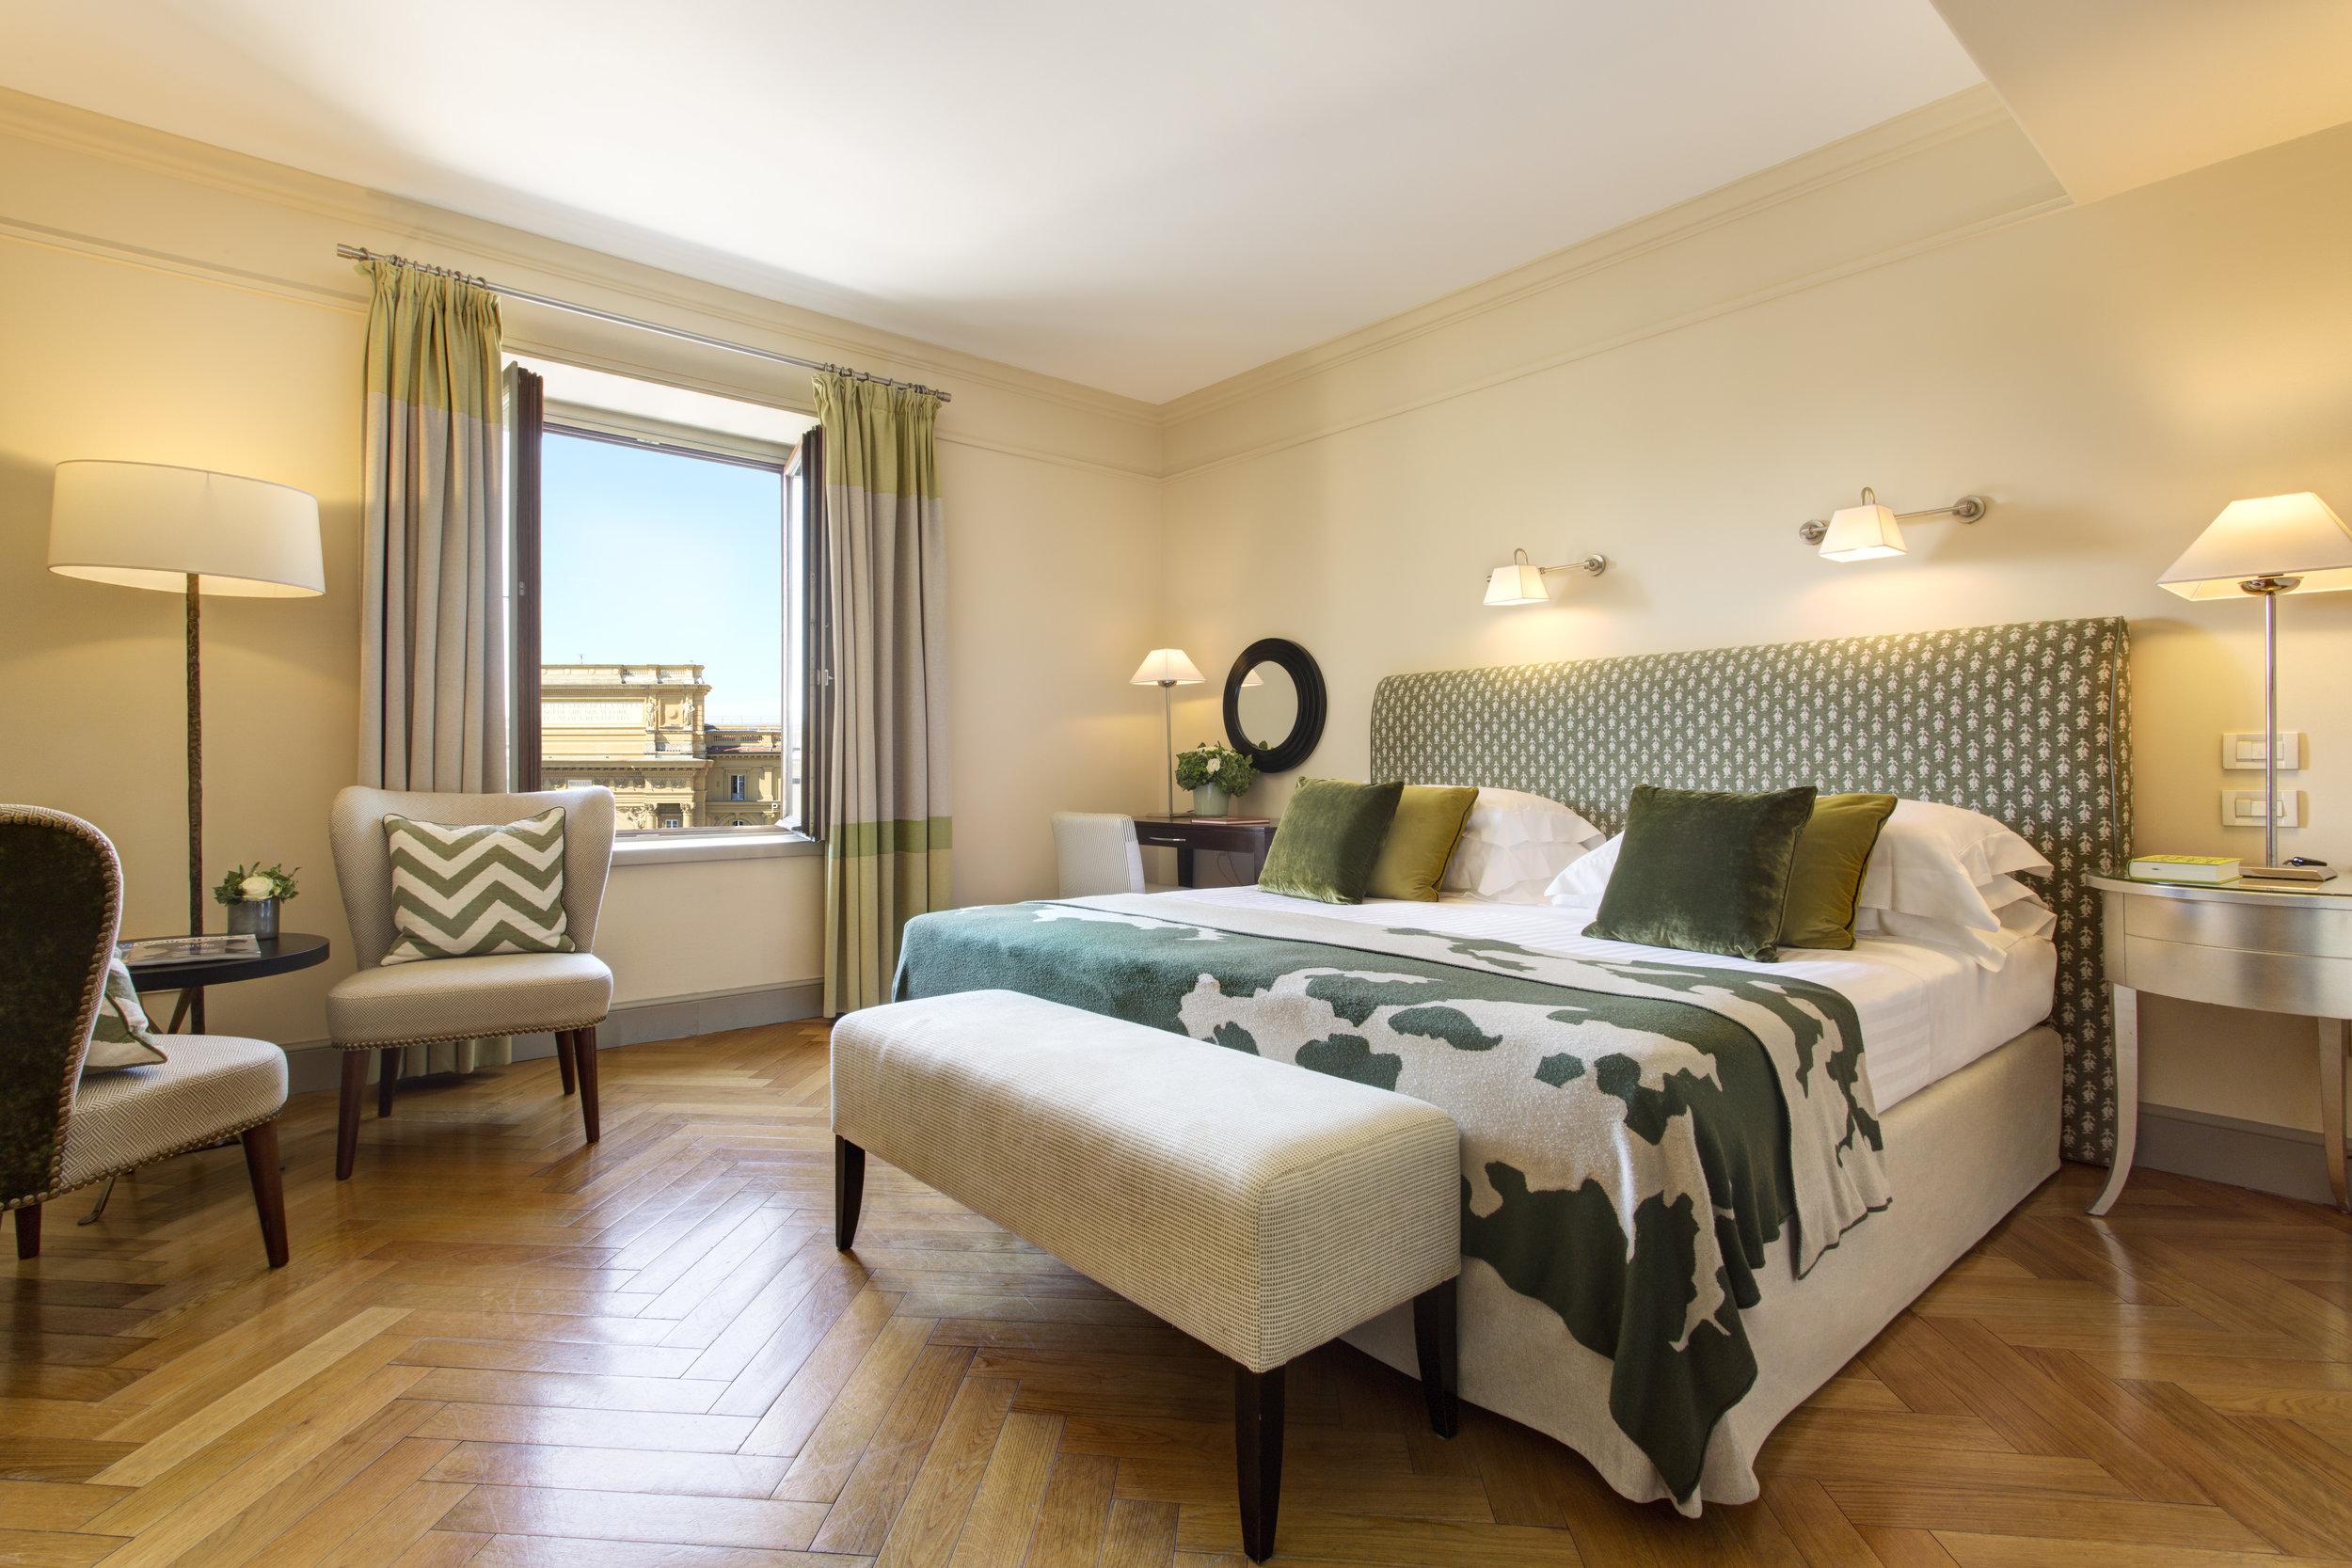 13 RFH Hotel Savoy - Piazza View Room 508 3543 JG Oct 16.JPG